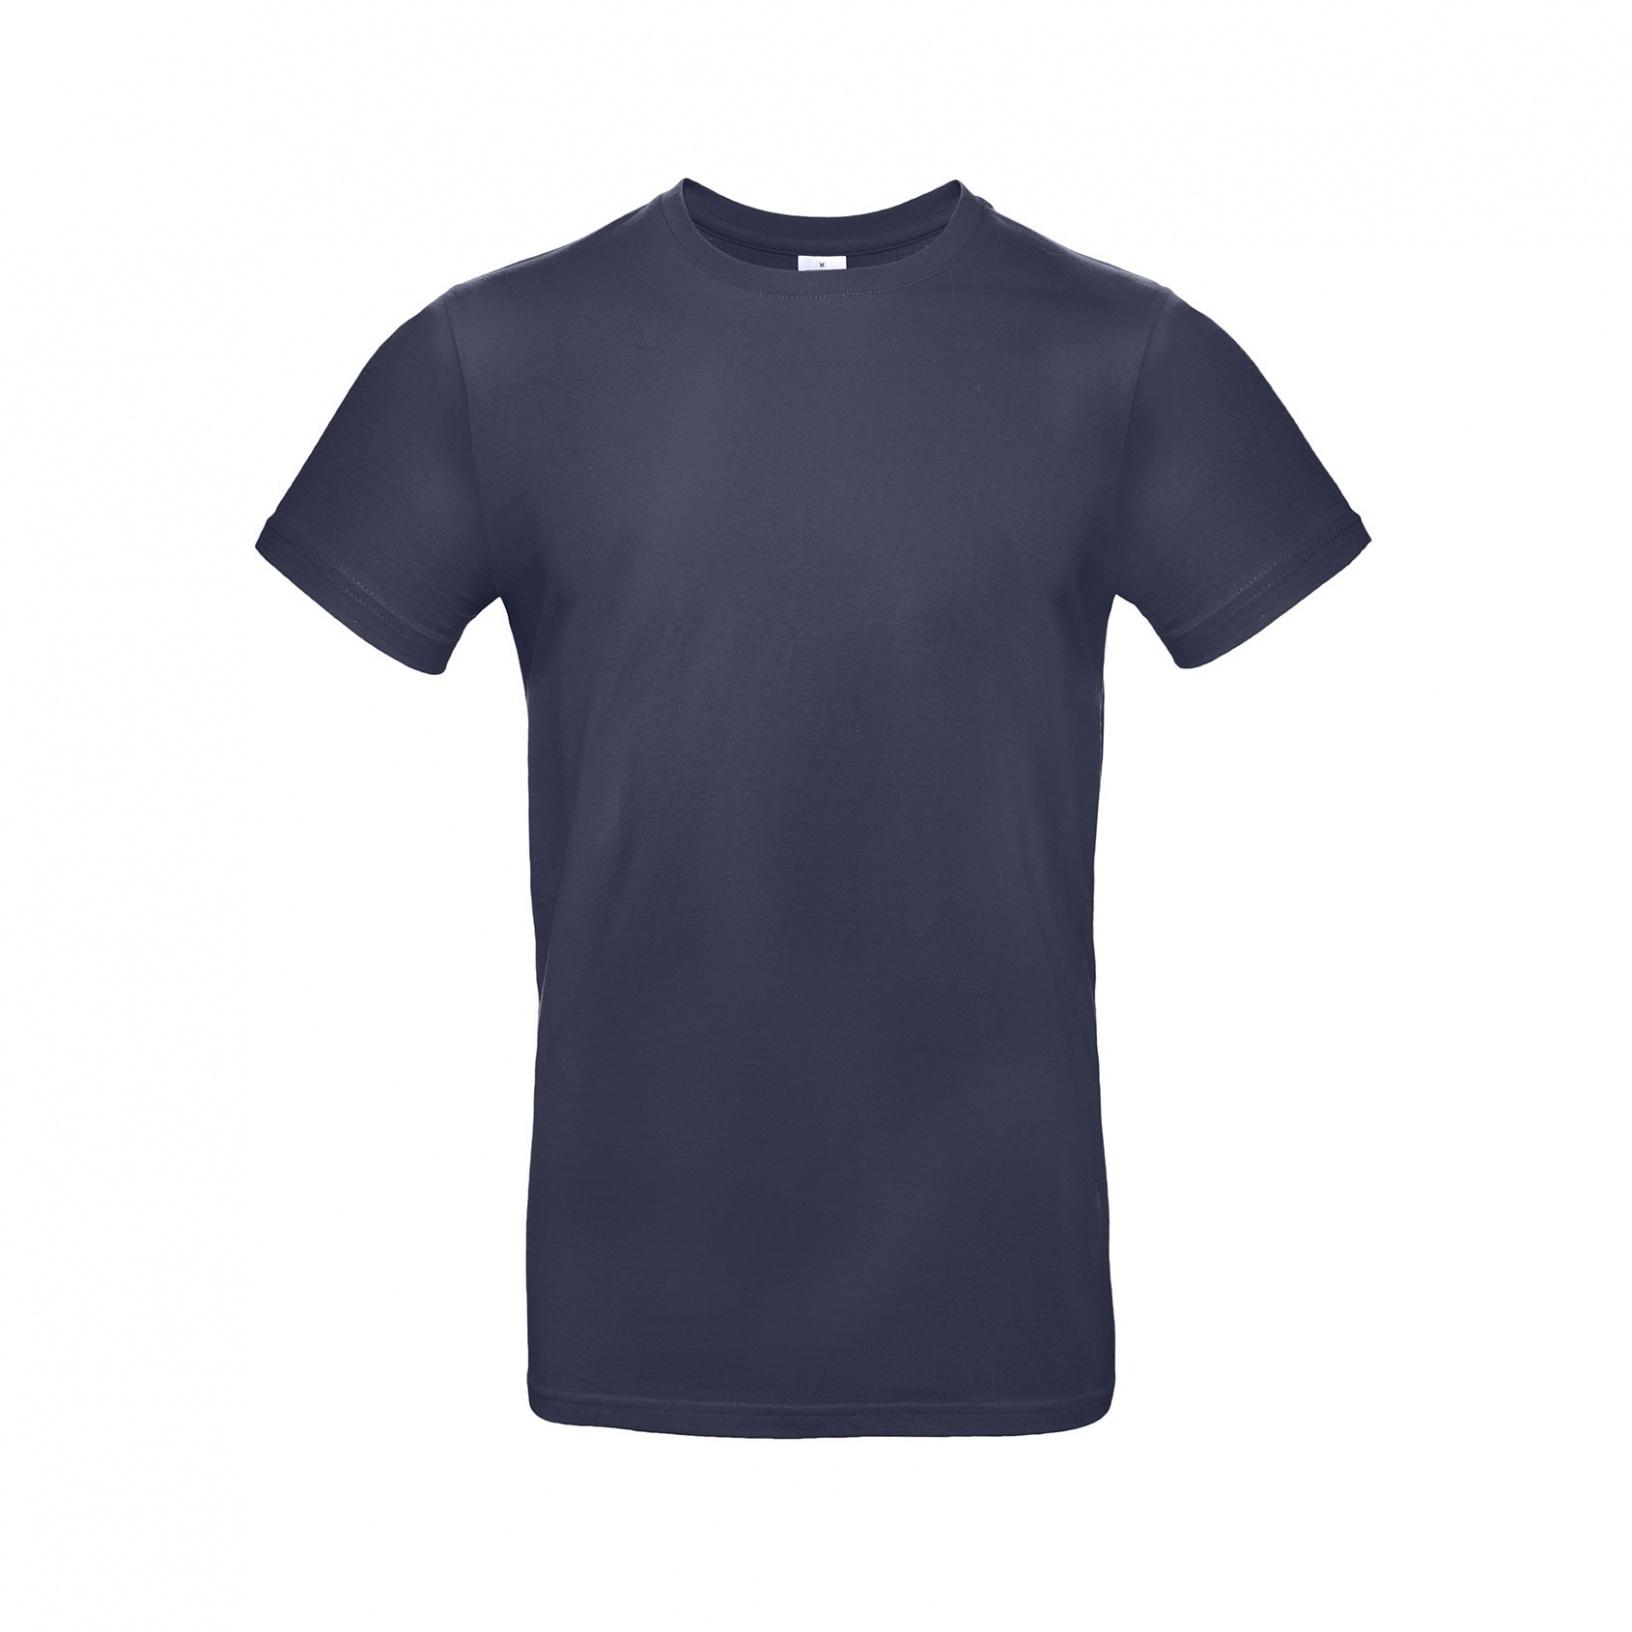 #E190 -  T-Shirt / B&C